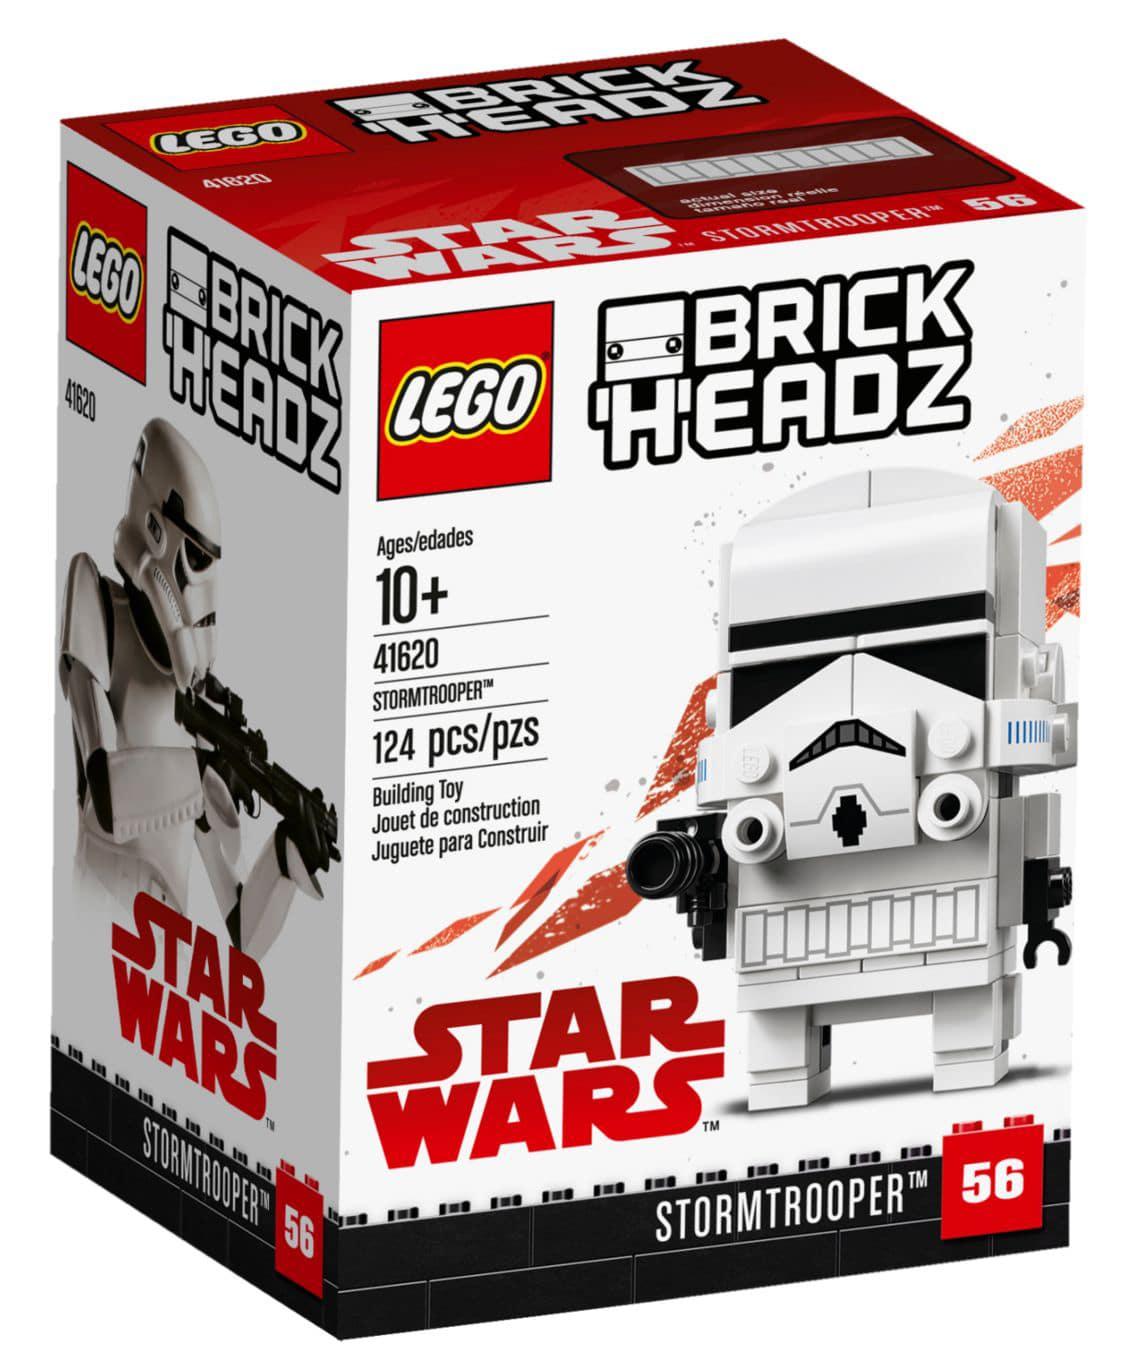 LEGO 41620 Stormtrooper BrickHeadz Box